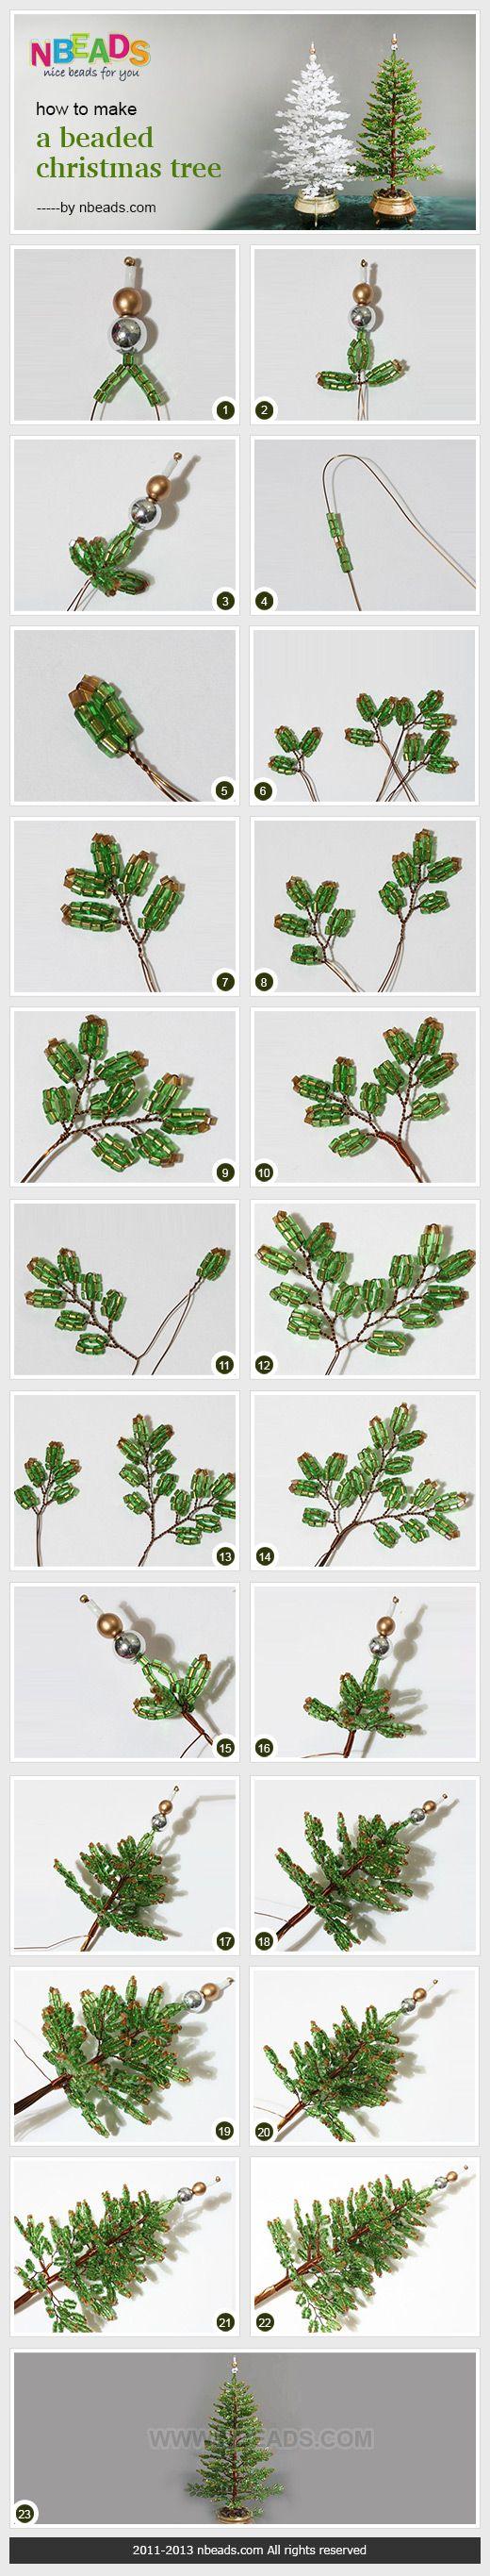 How to Make A Beaded Christmas Tree photo tutorial